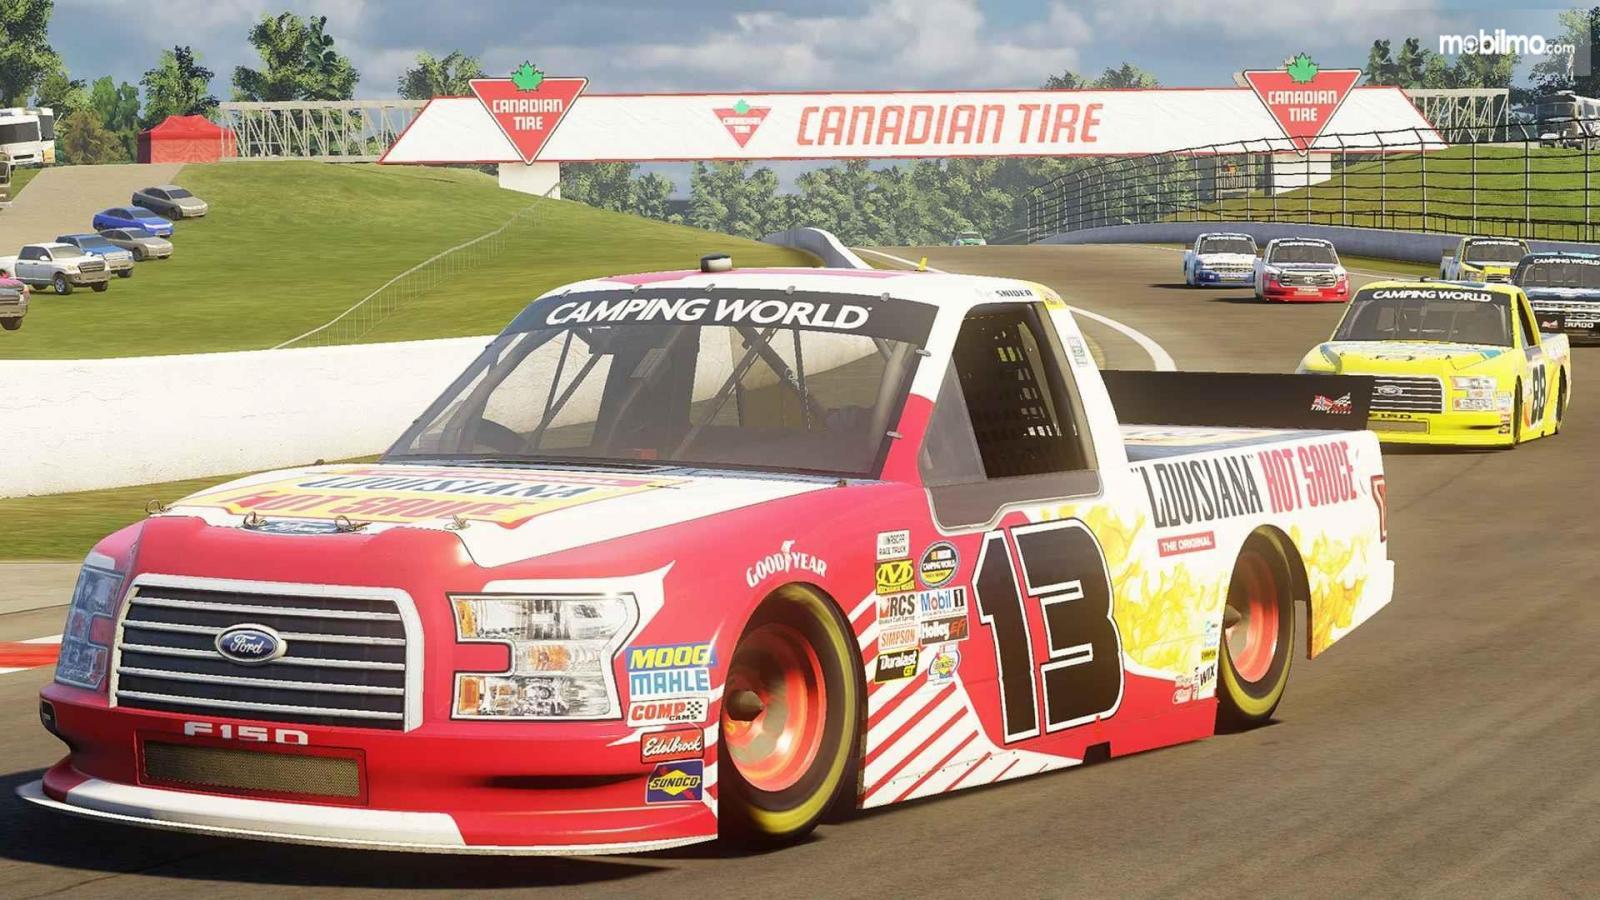 Gambar yang menunjukan mobil NASCAR Heat 3